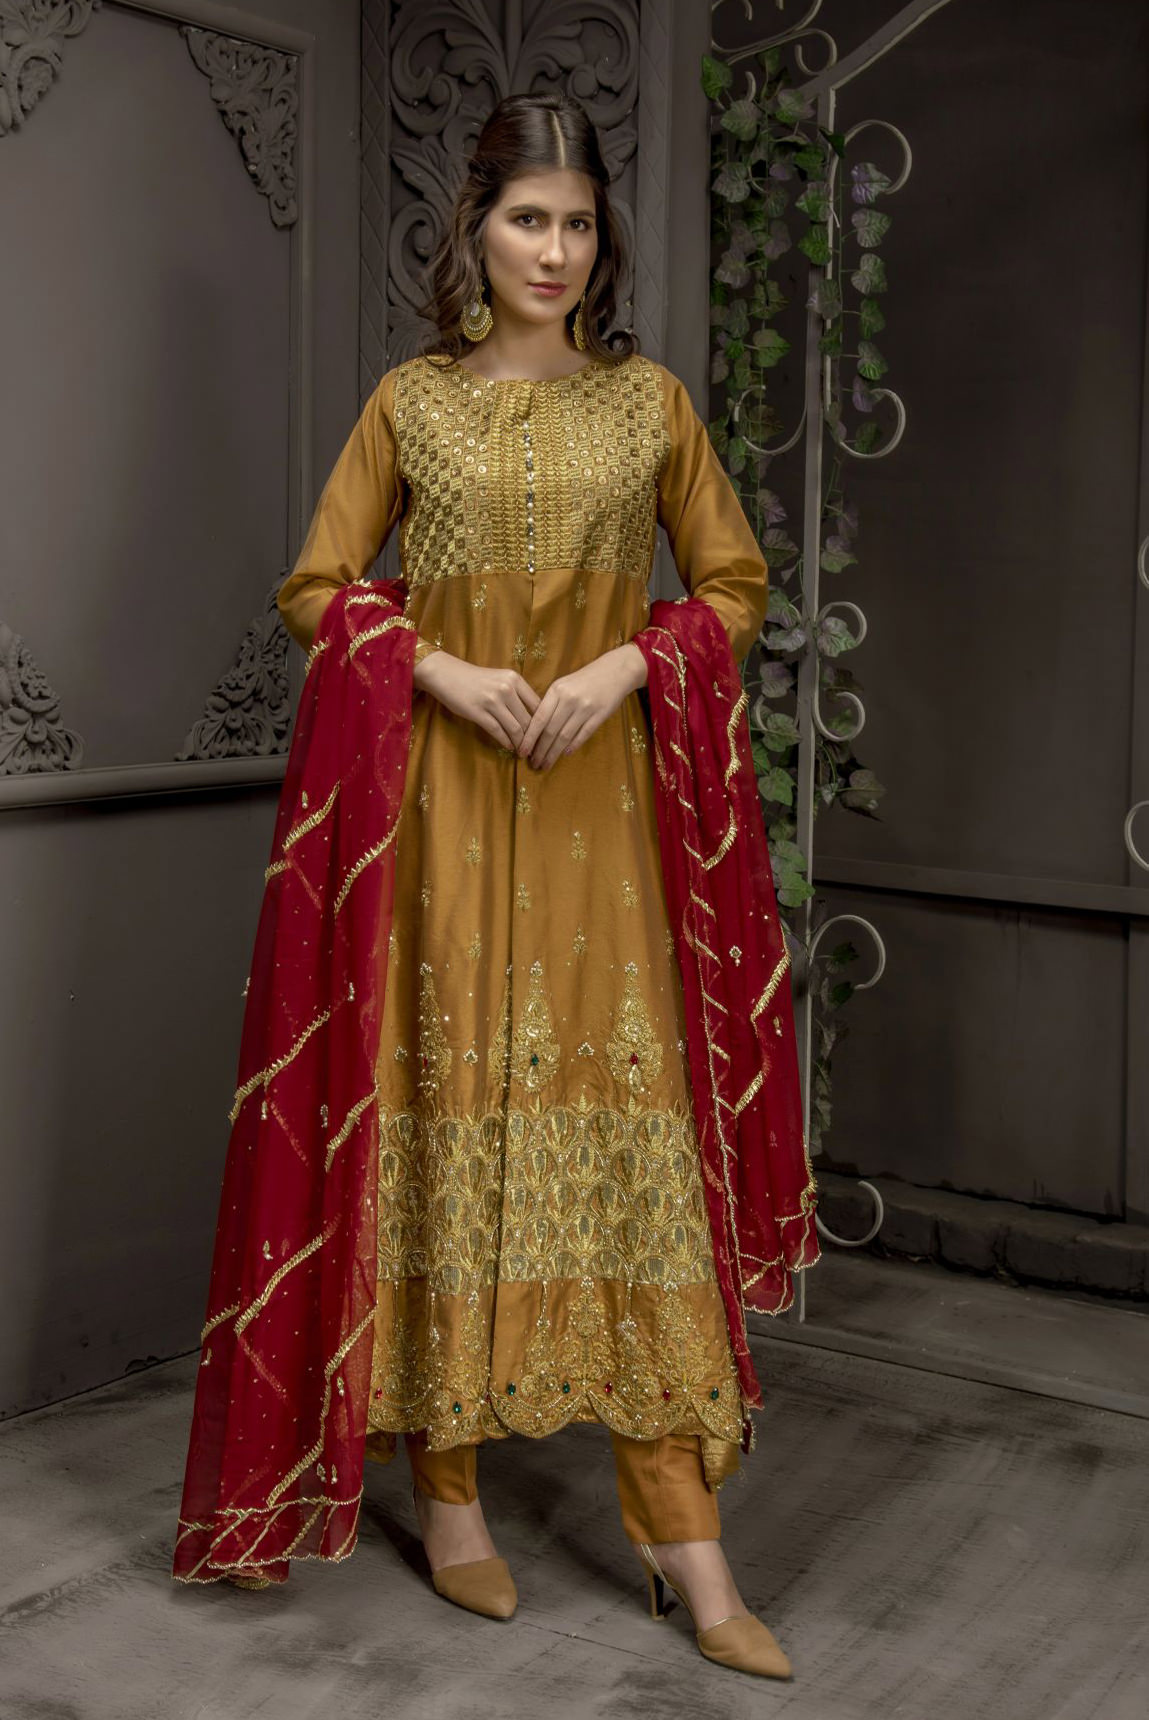 Buy Exclusive MUSAtard And Maroon Bridal Wear – Sabd218 Online In USA, Uk & Pakistan